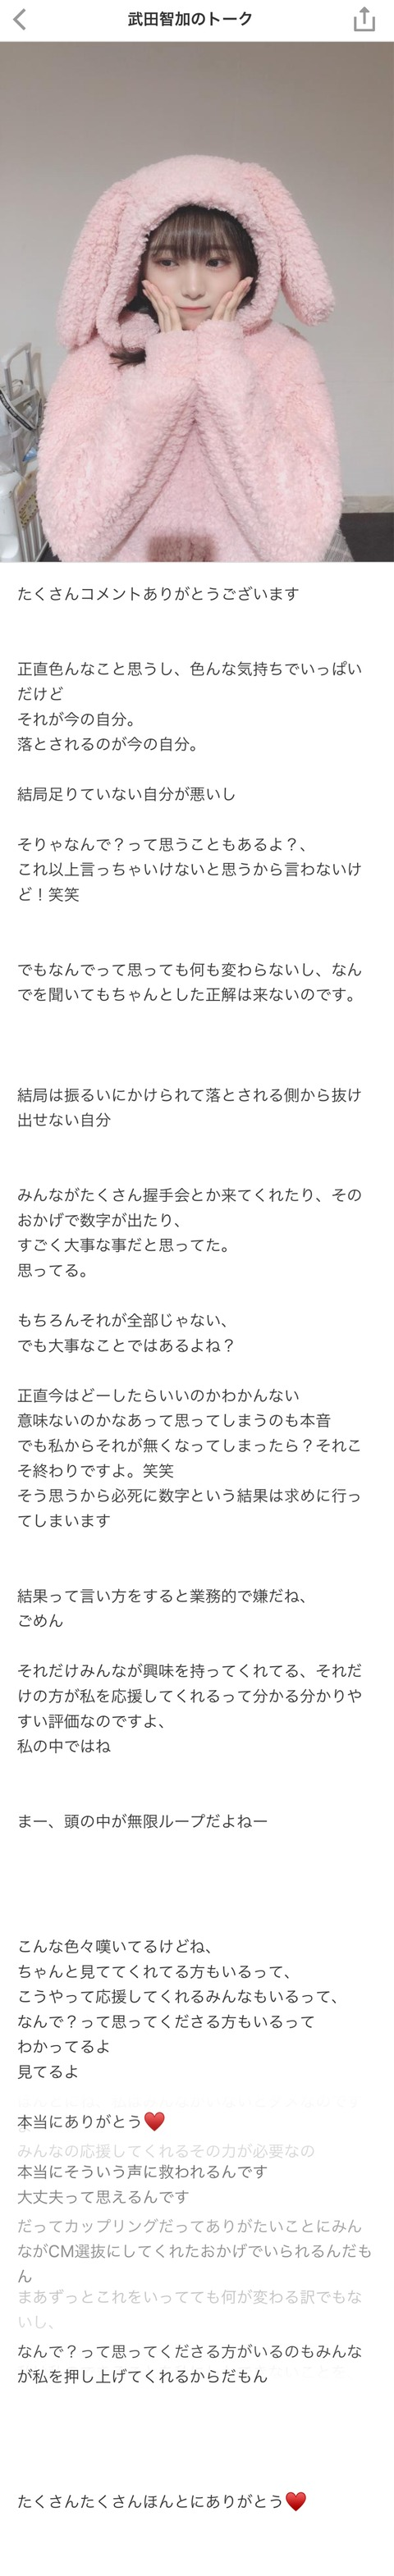 【HKT48】武田智加「選抜決定、なんで?と思うこともある」